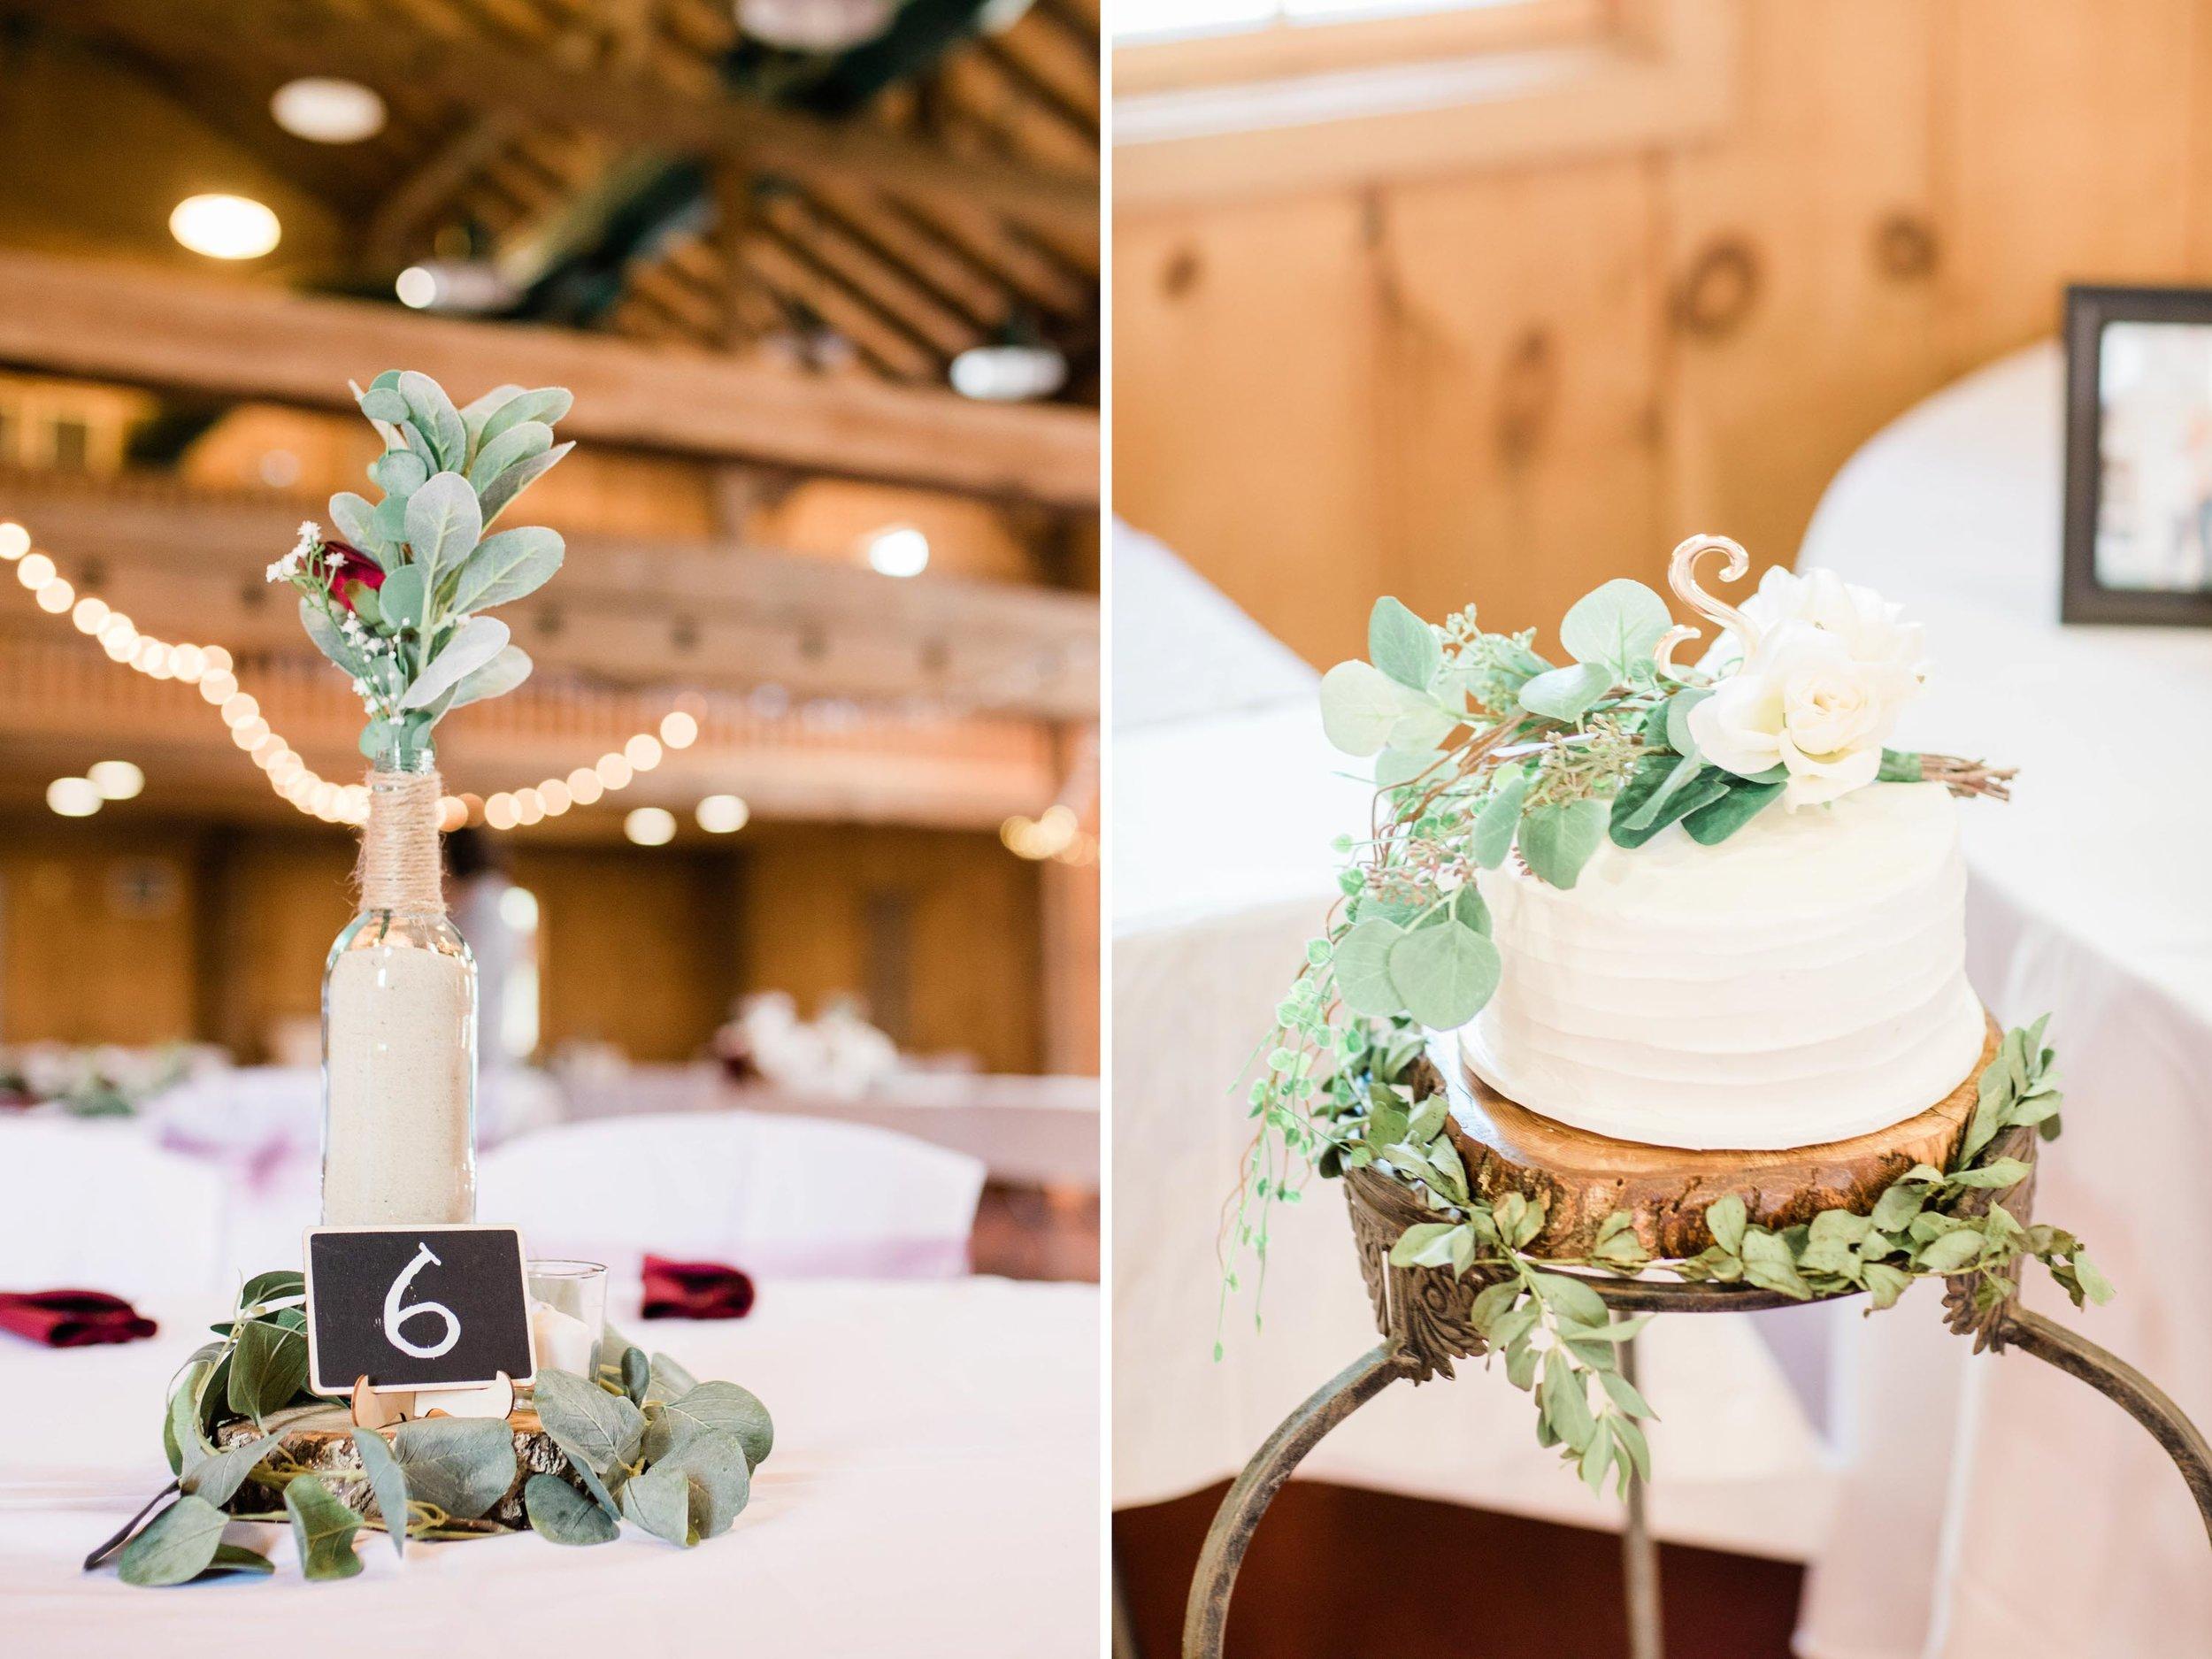 highes center wedding.jpg